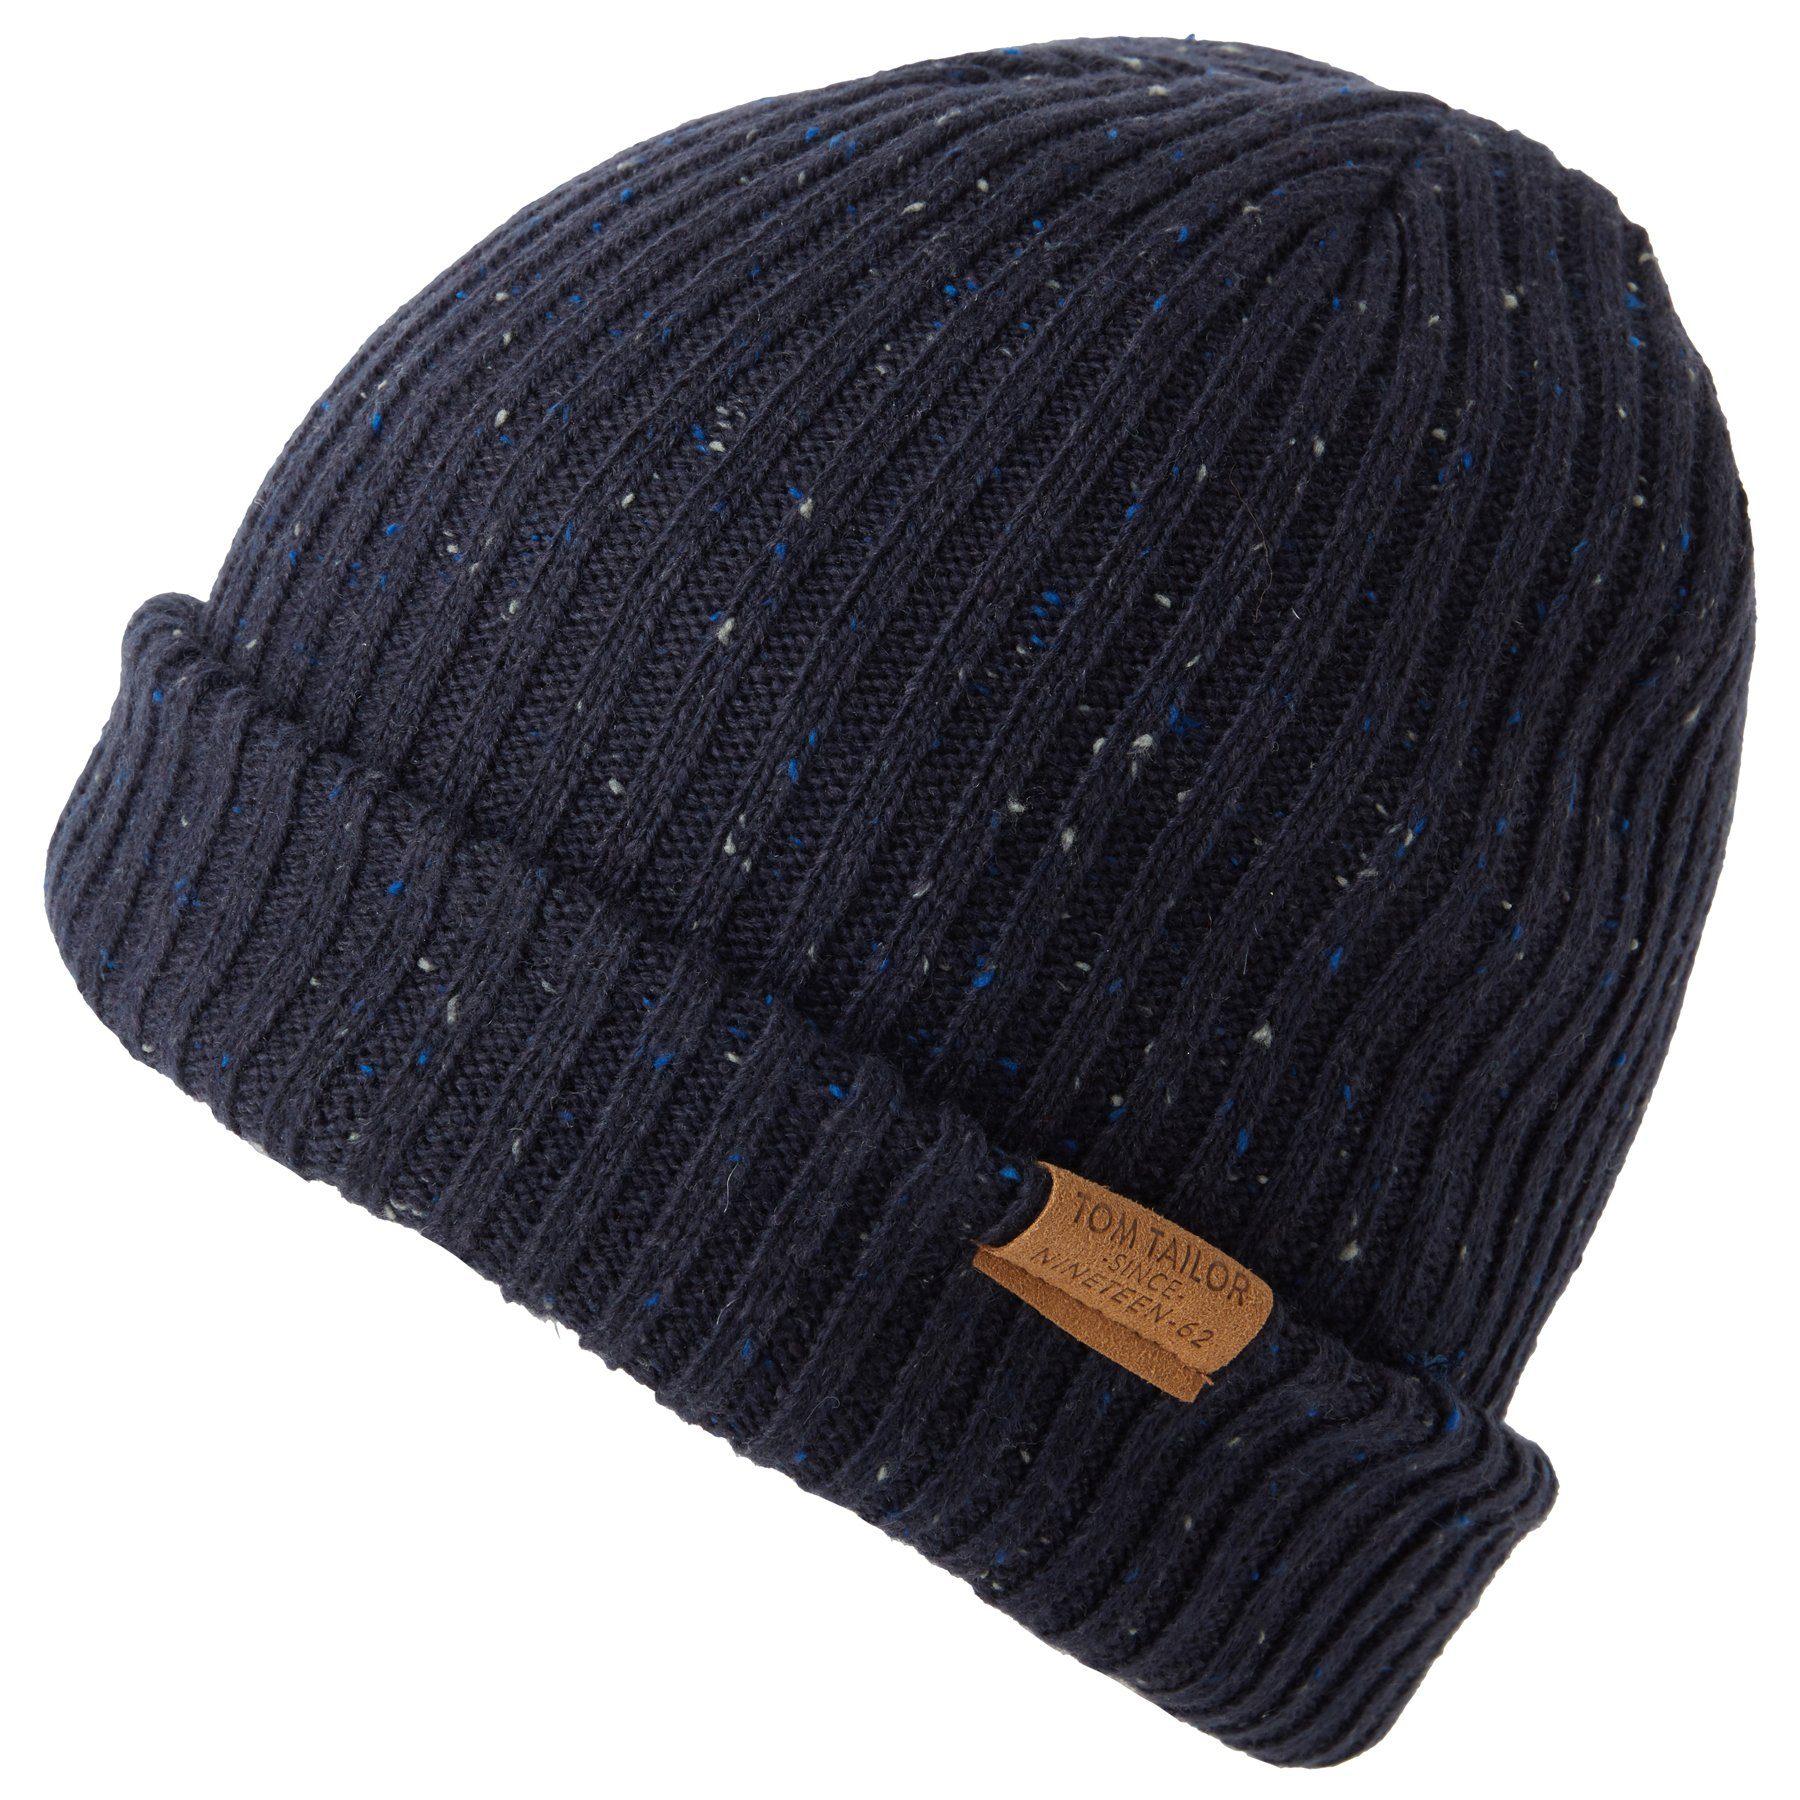 TOM TAILOR Mütze »Mütze mit Ripp-Struktur«